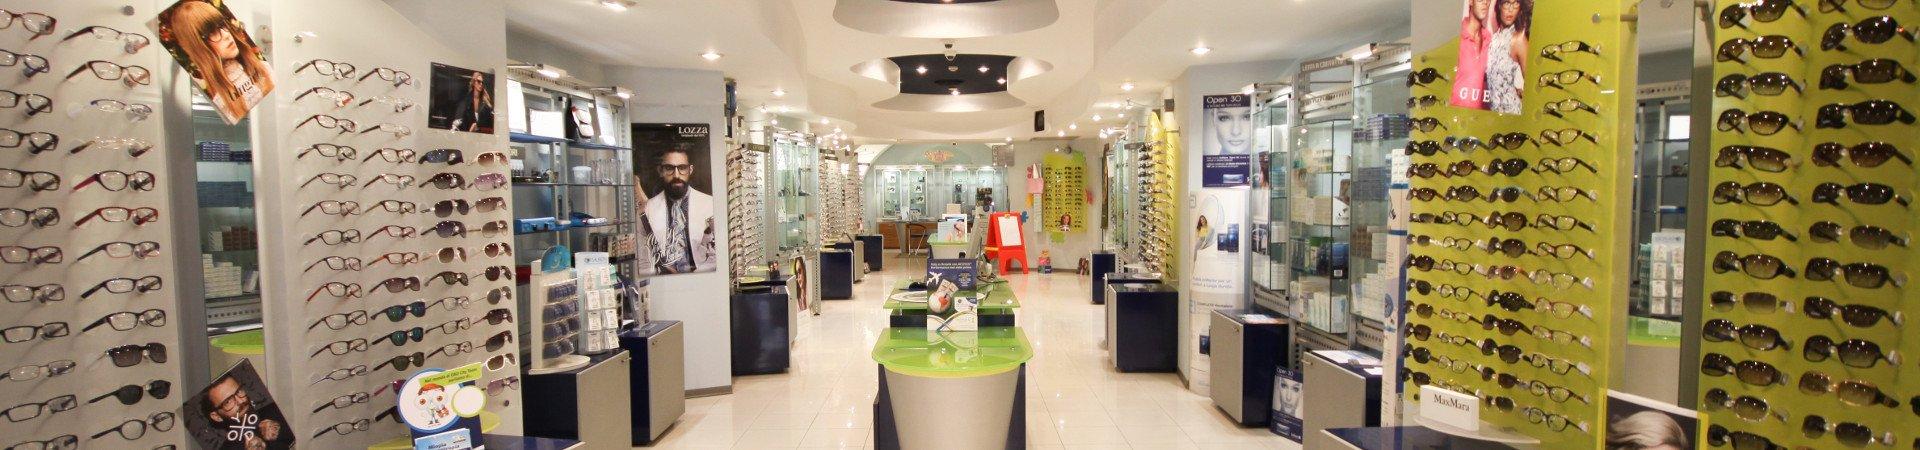 Inside the Ottica Brigida store